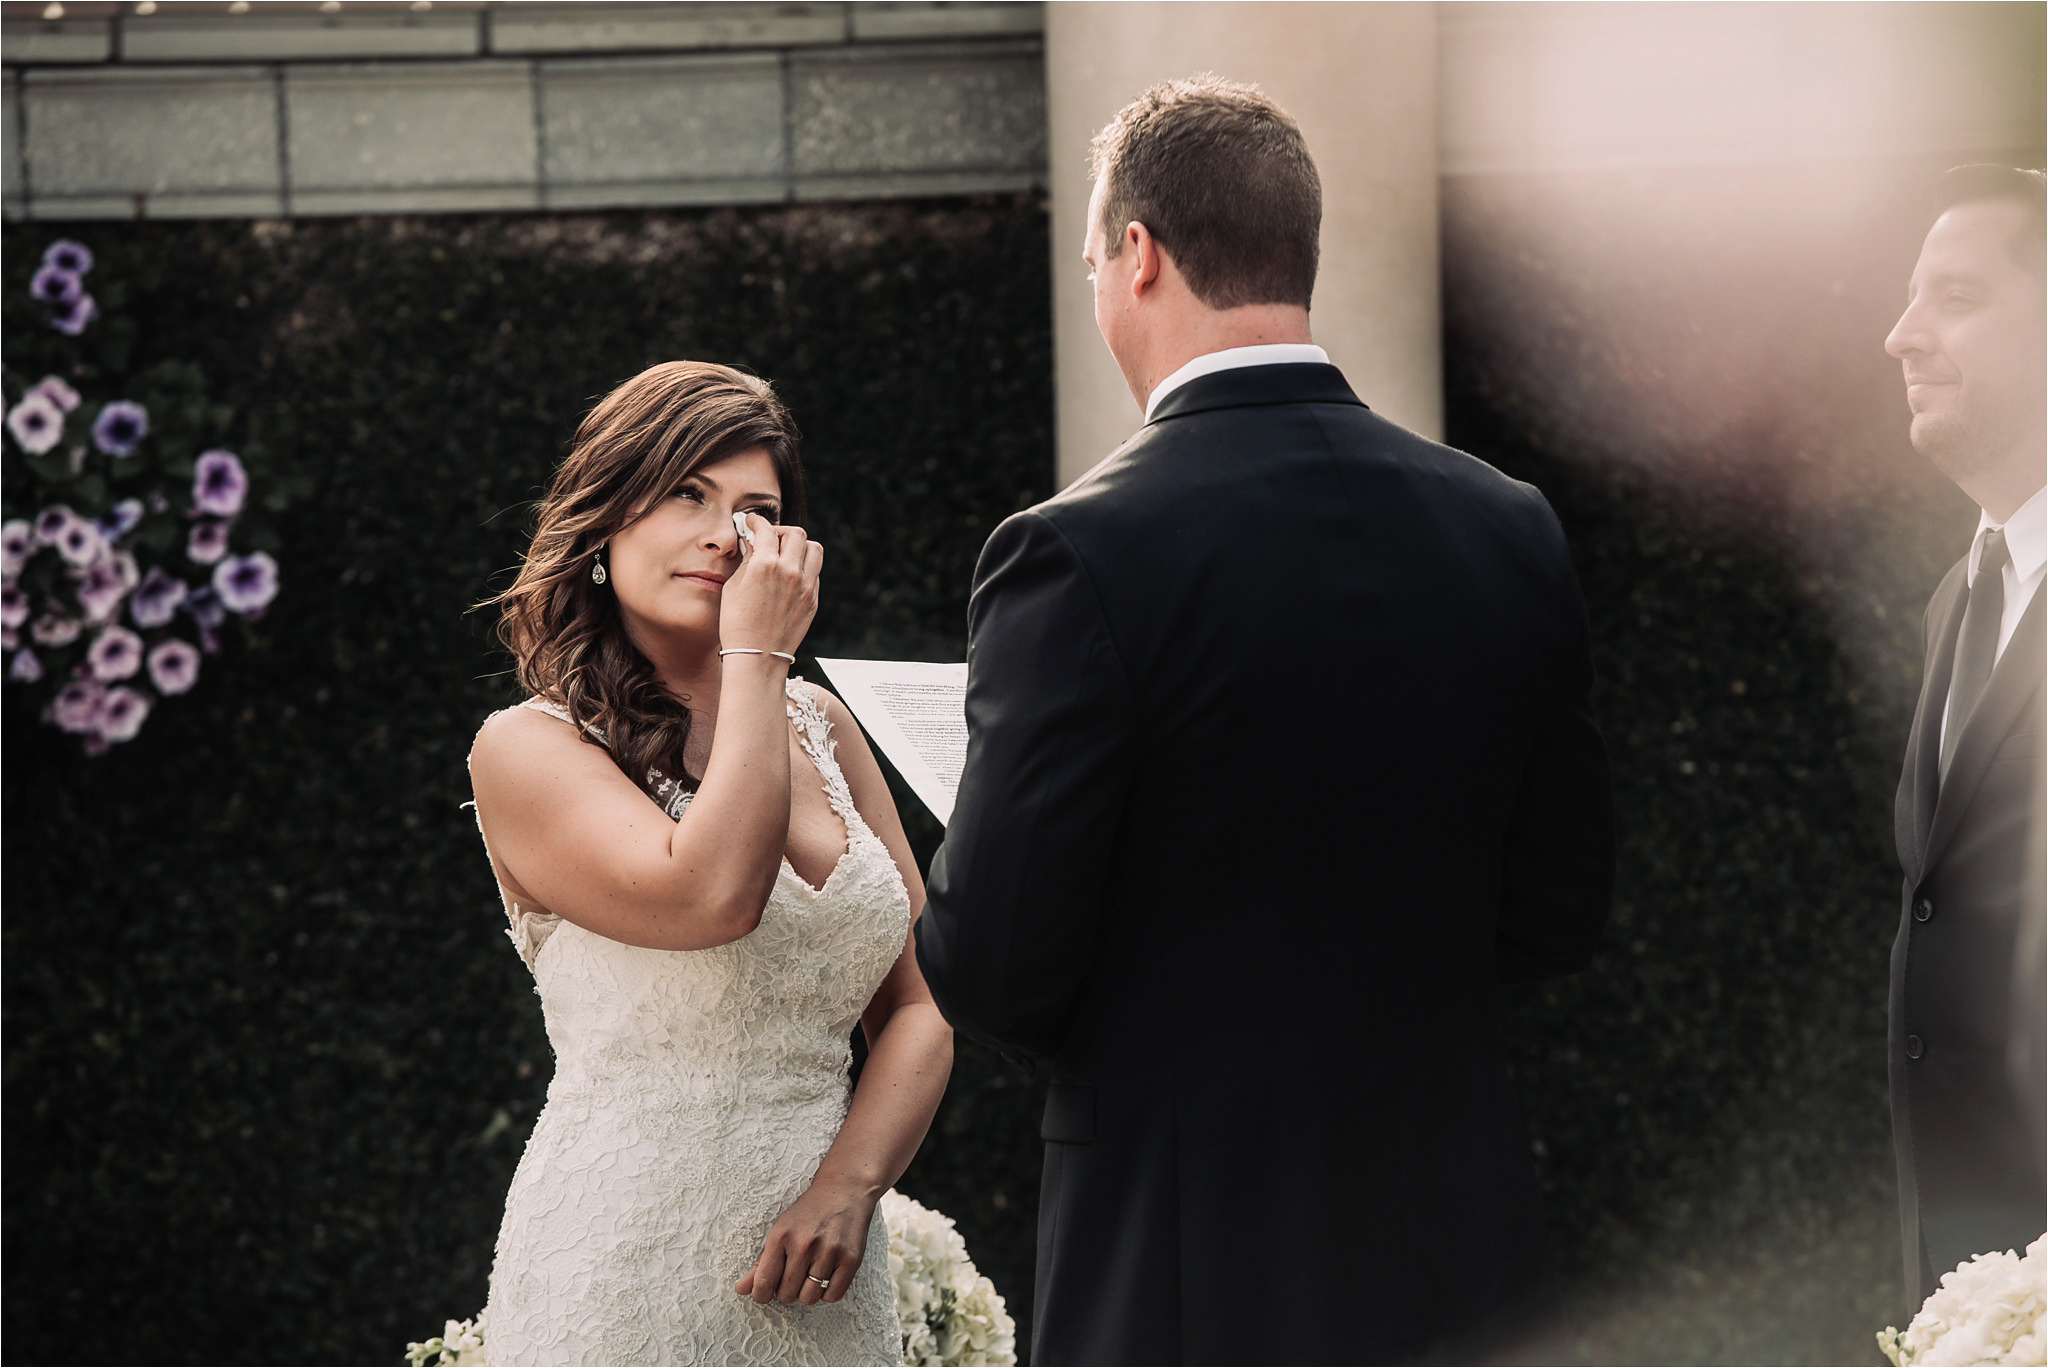 jessica-roman-photography-arden hills wedding photograpger-sacramento-boise-26.jpg